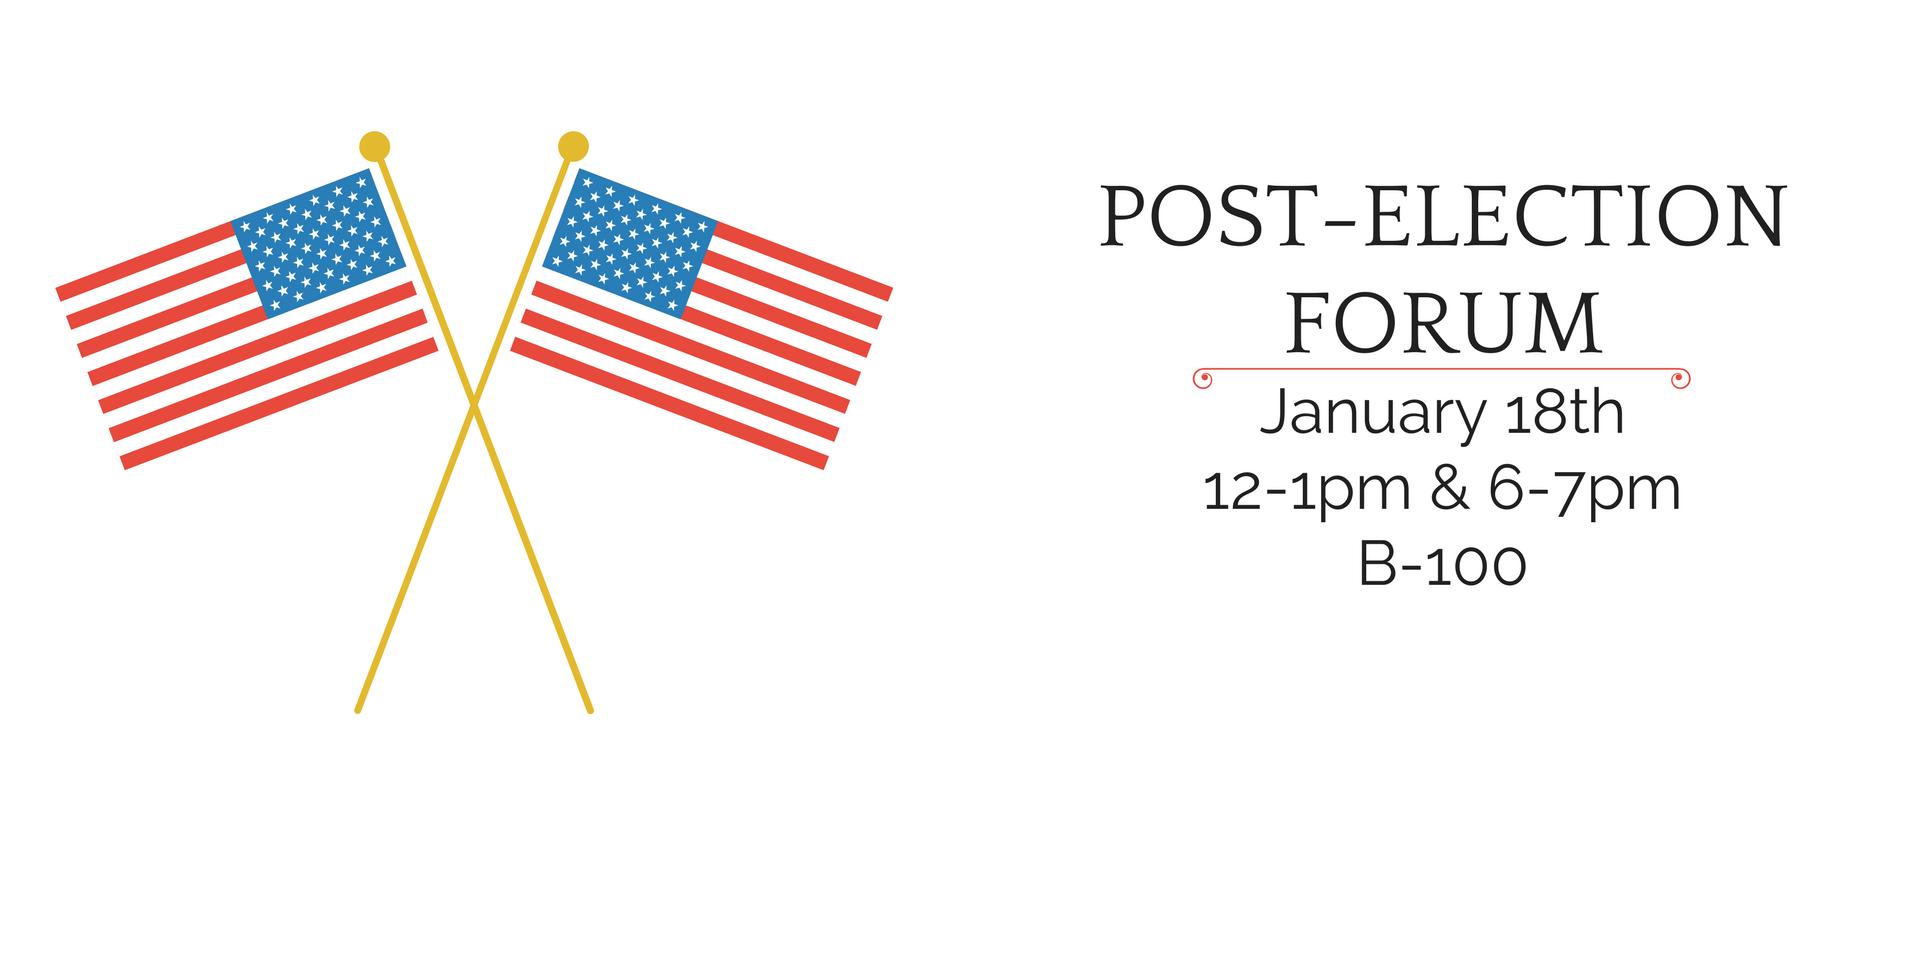 Post-Election Inauguration Forum